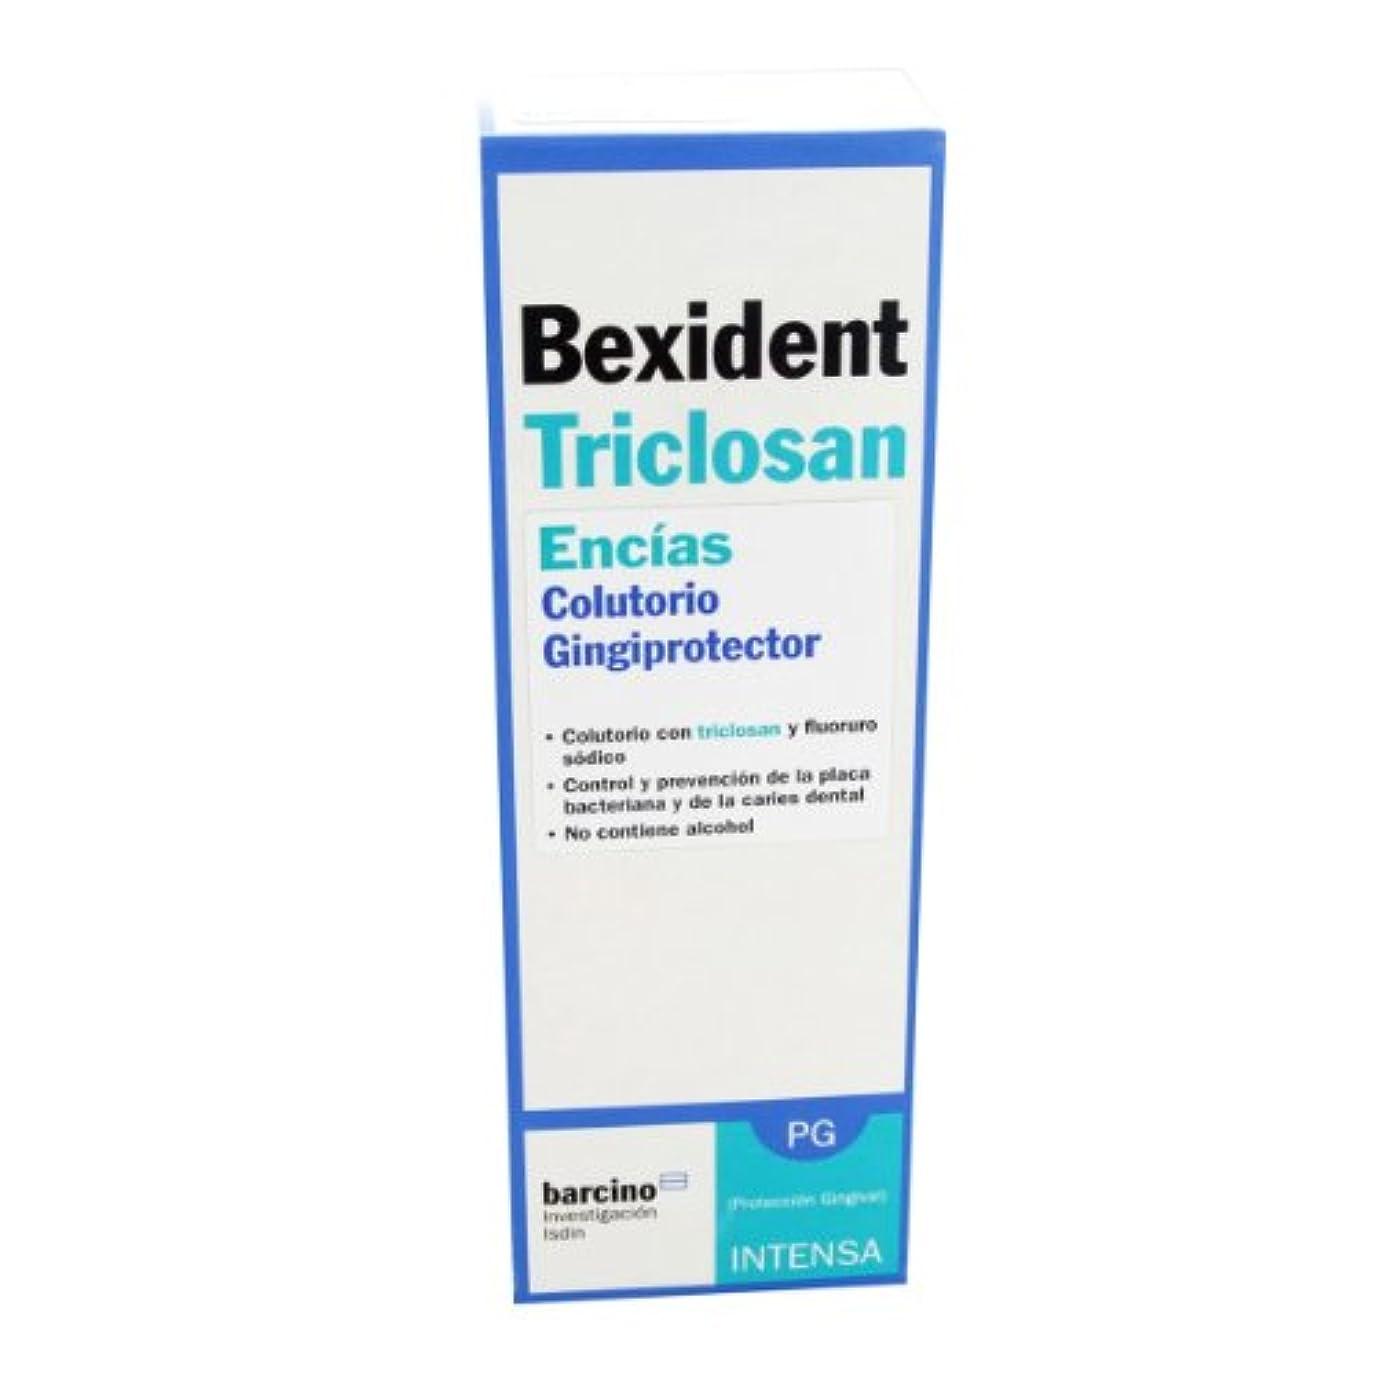 幾分絵保護Bexident Gum Maintenance Triclosan Mouthwash 250ml [並行輸入品]